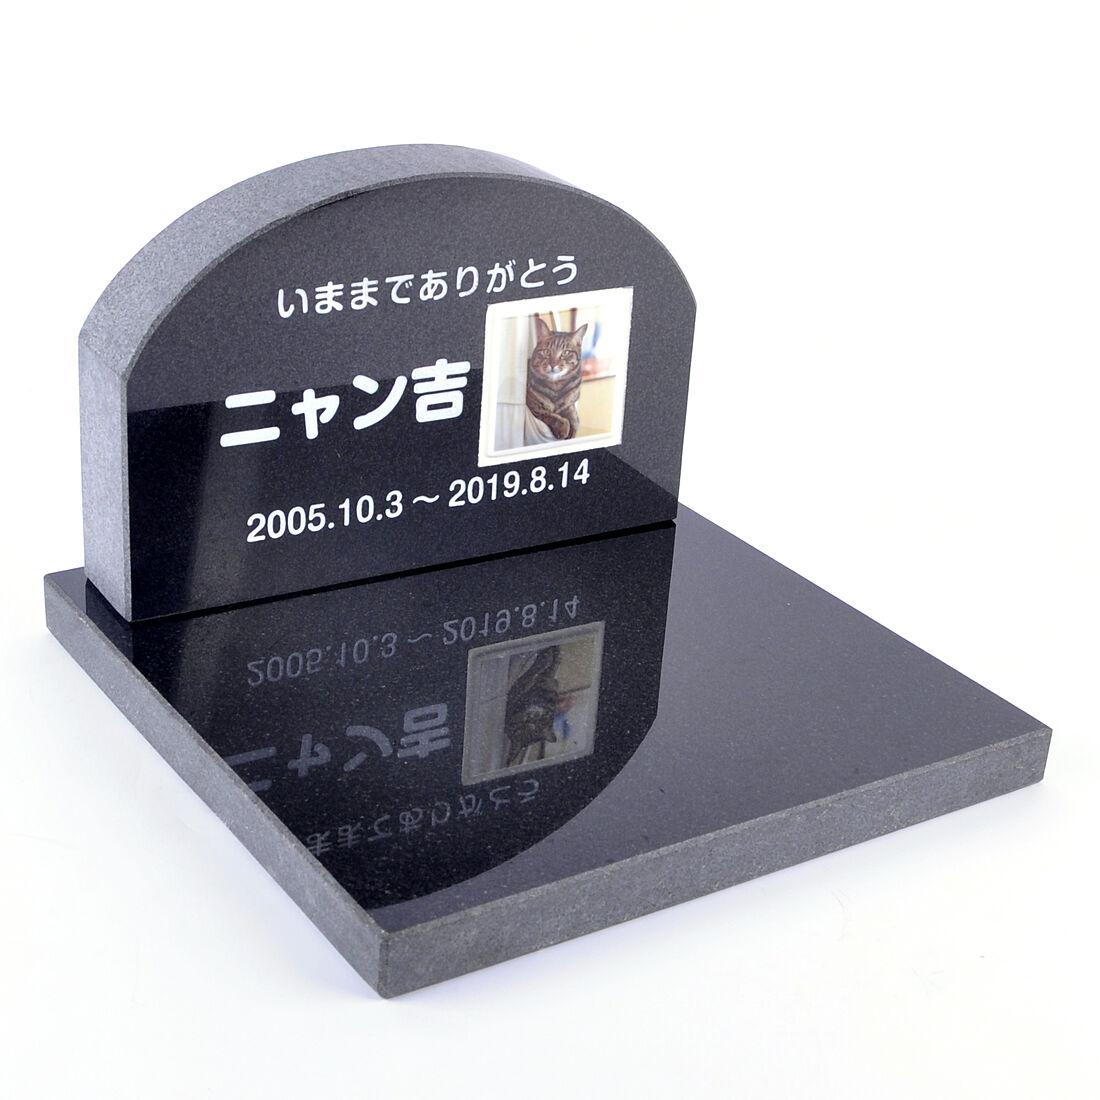 Pet&Love. ペットのお墓 天然石製 セット型 遺影付きタイプ 御影石 ブラック アーチ 正方形写真タイプ(お客様の写真を印刷) 猫モデル  【HLS_DU】【楽ギフ_名入れ】 attr169attr ctgr2ctgr sml3sml+ctgr2ctgr noanml